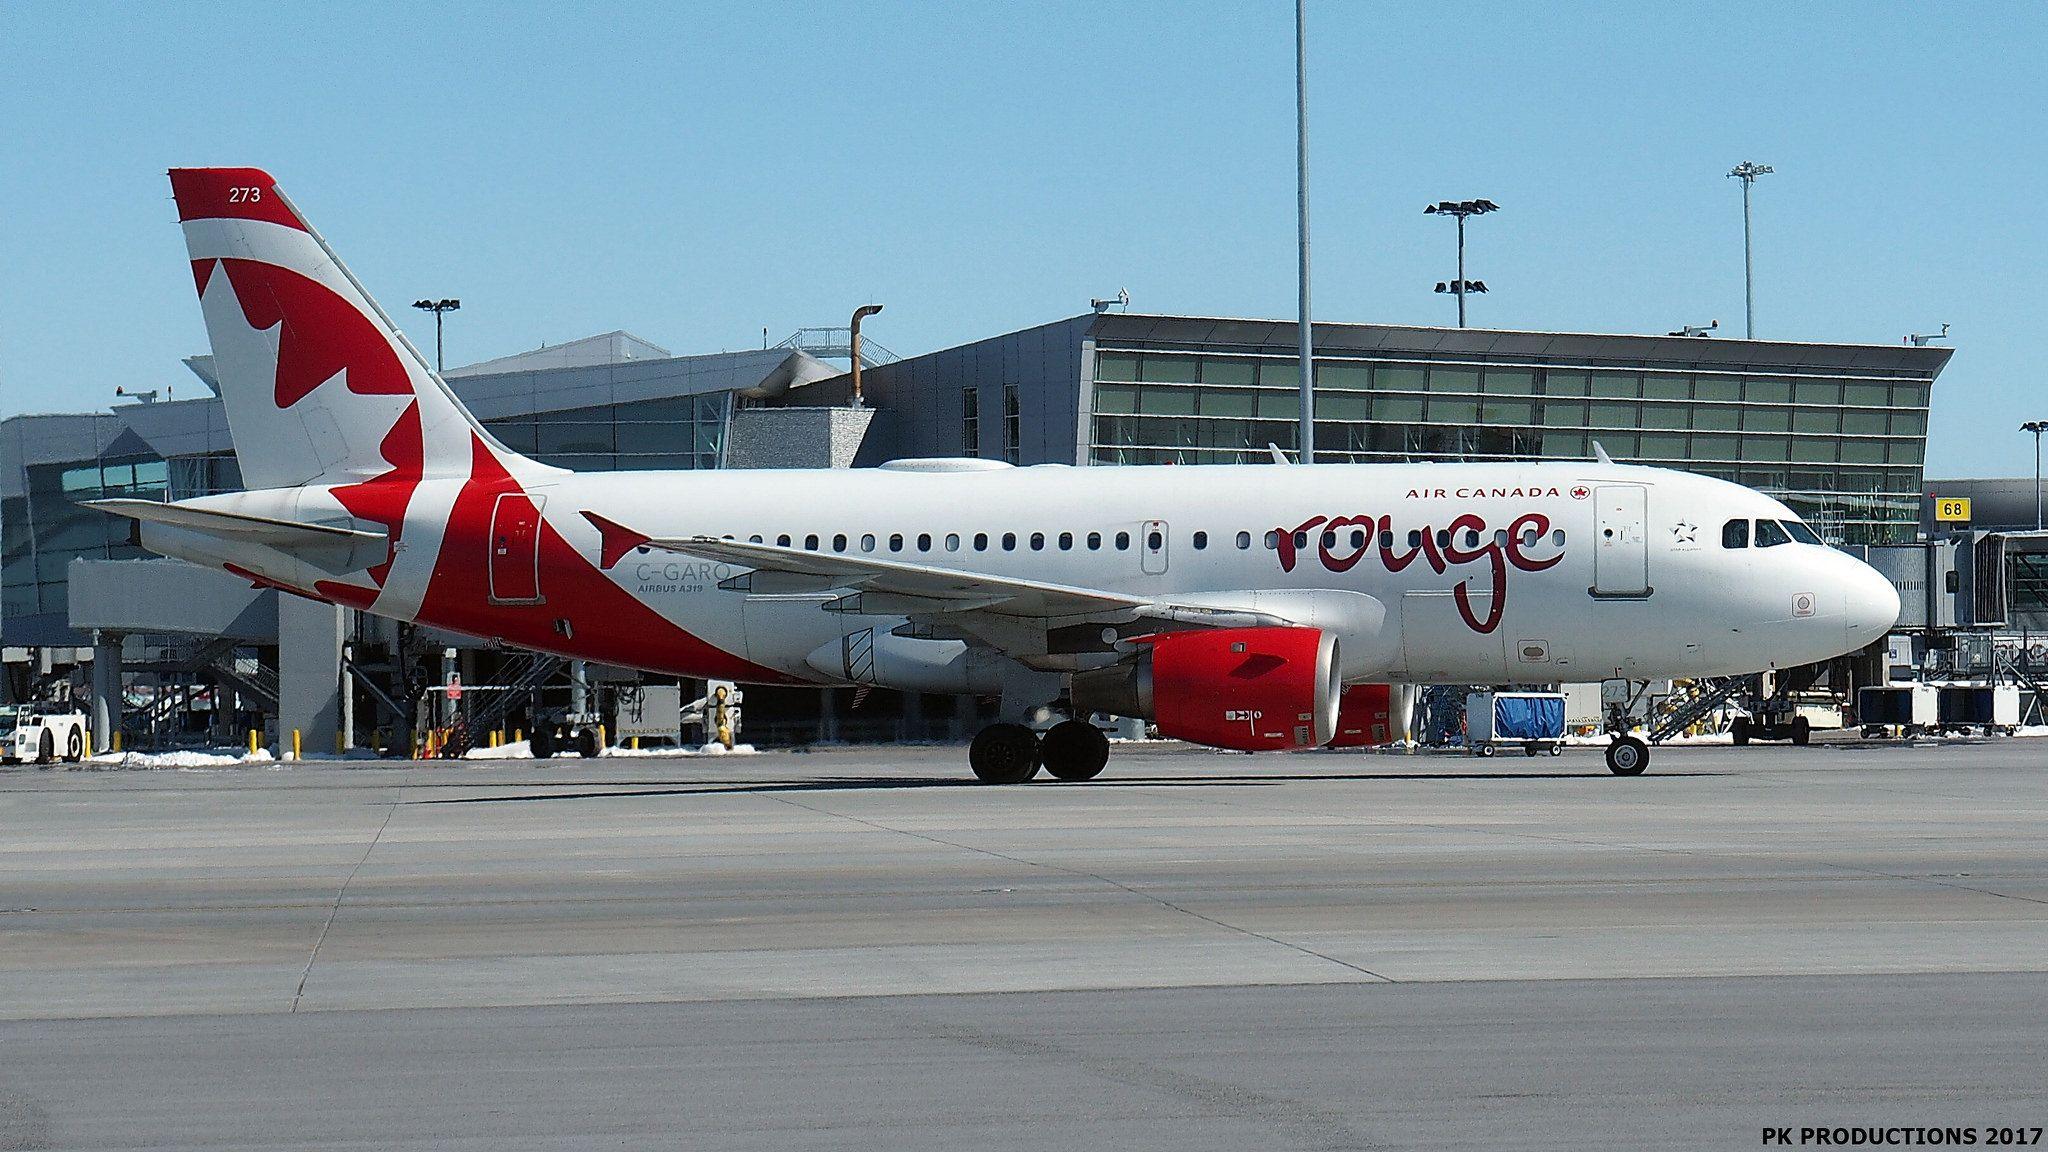 P3181391 TRUDEAU Airbus Narrowbodies Air canada rouge